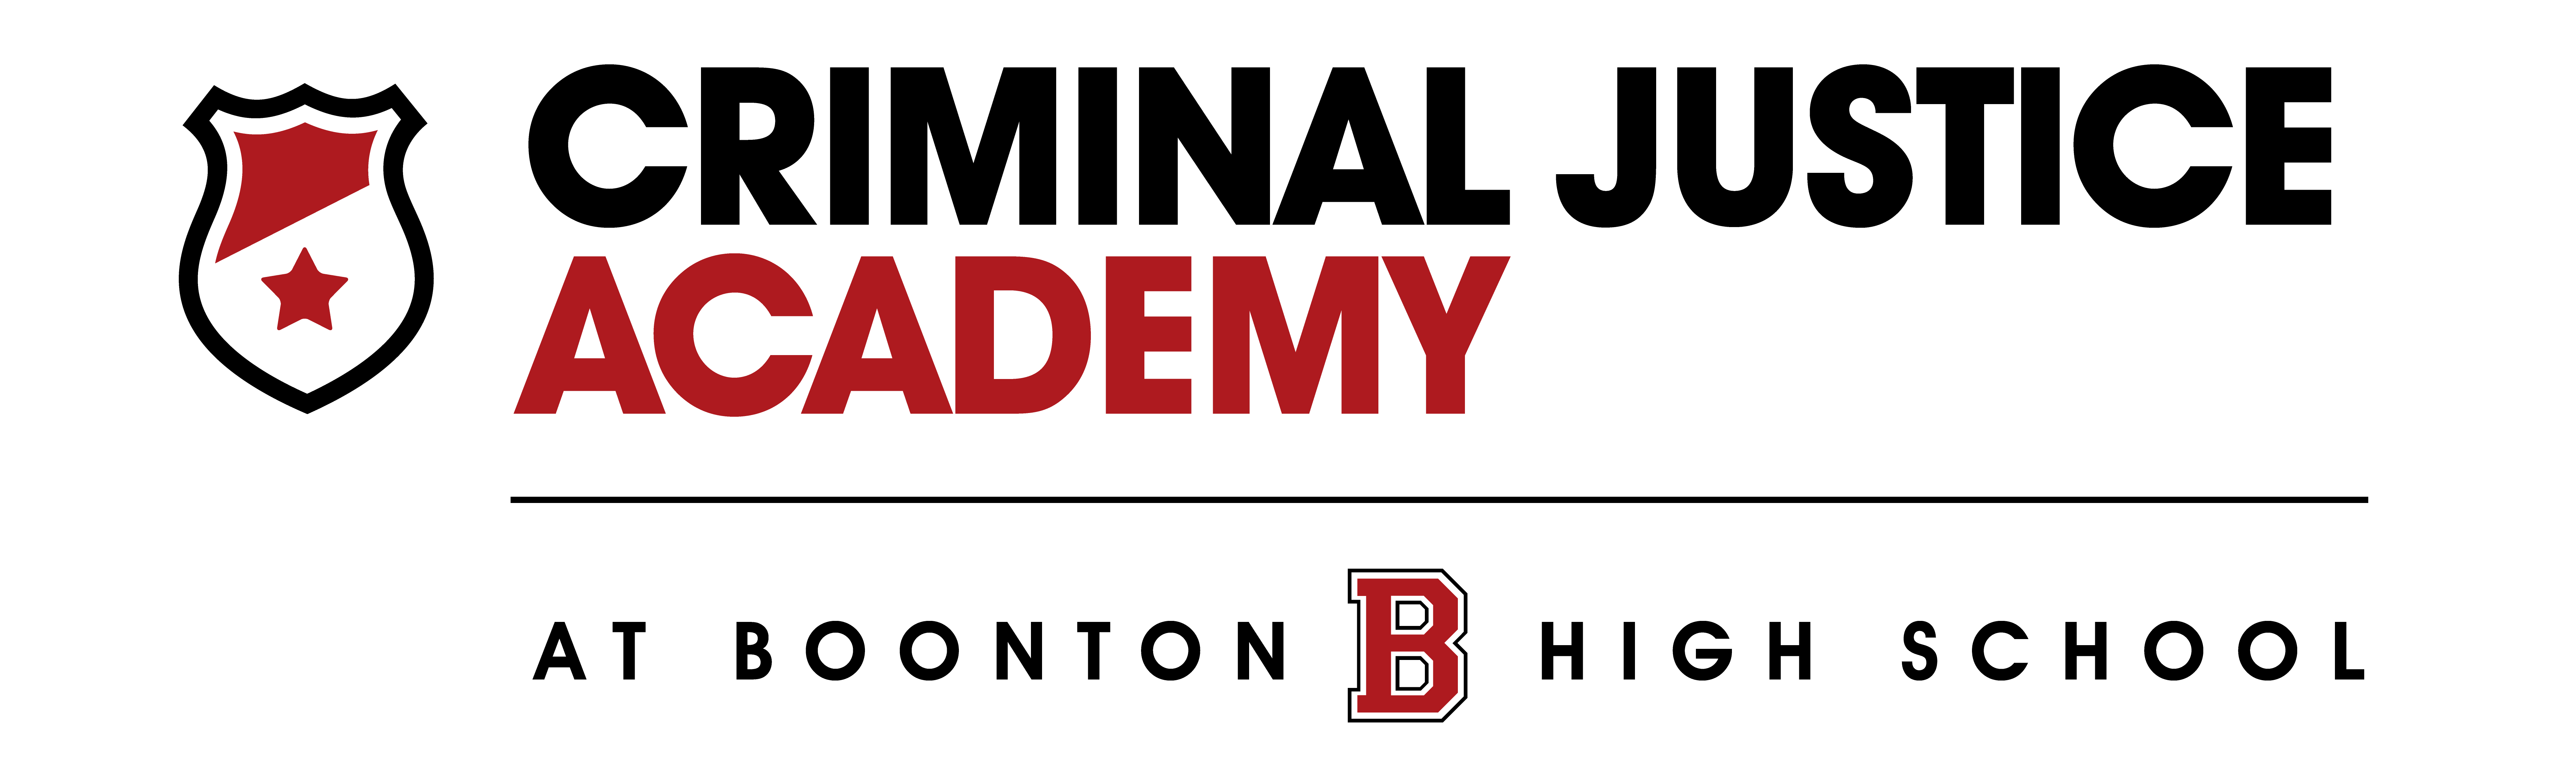 Criminal Justice Academy logo